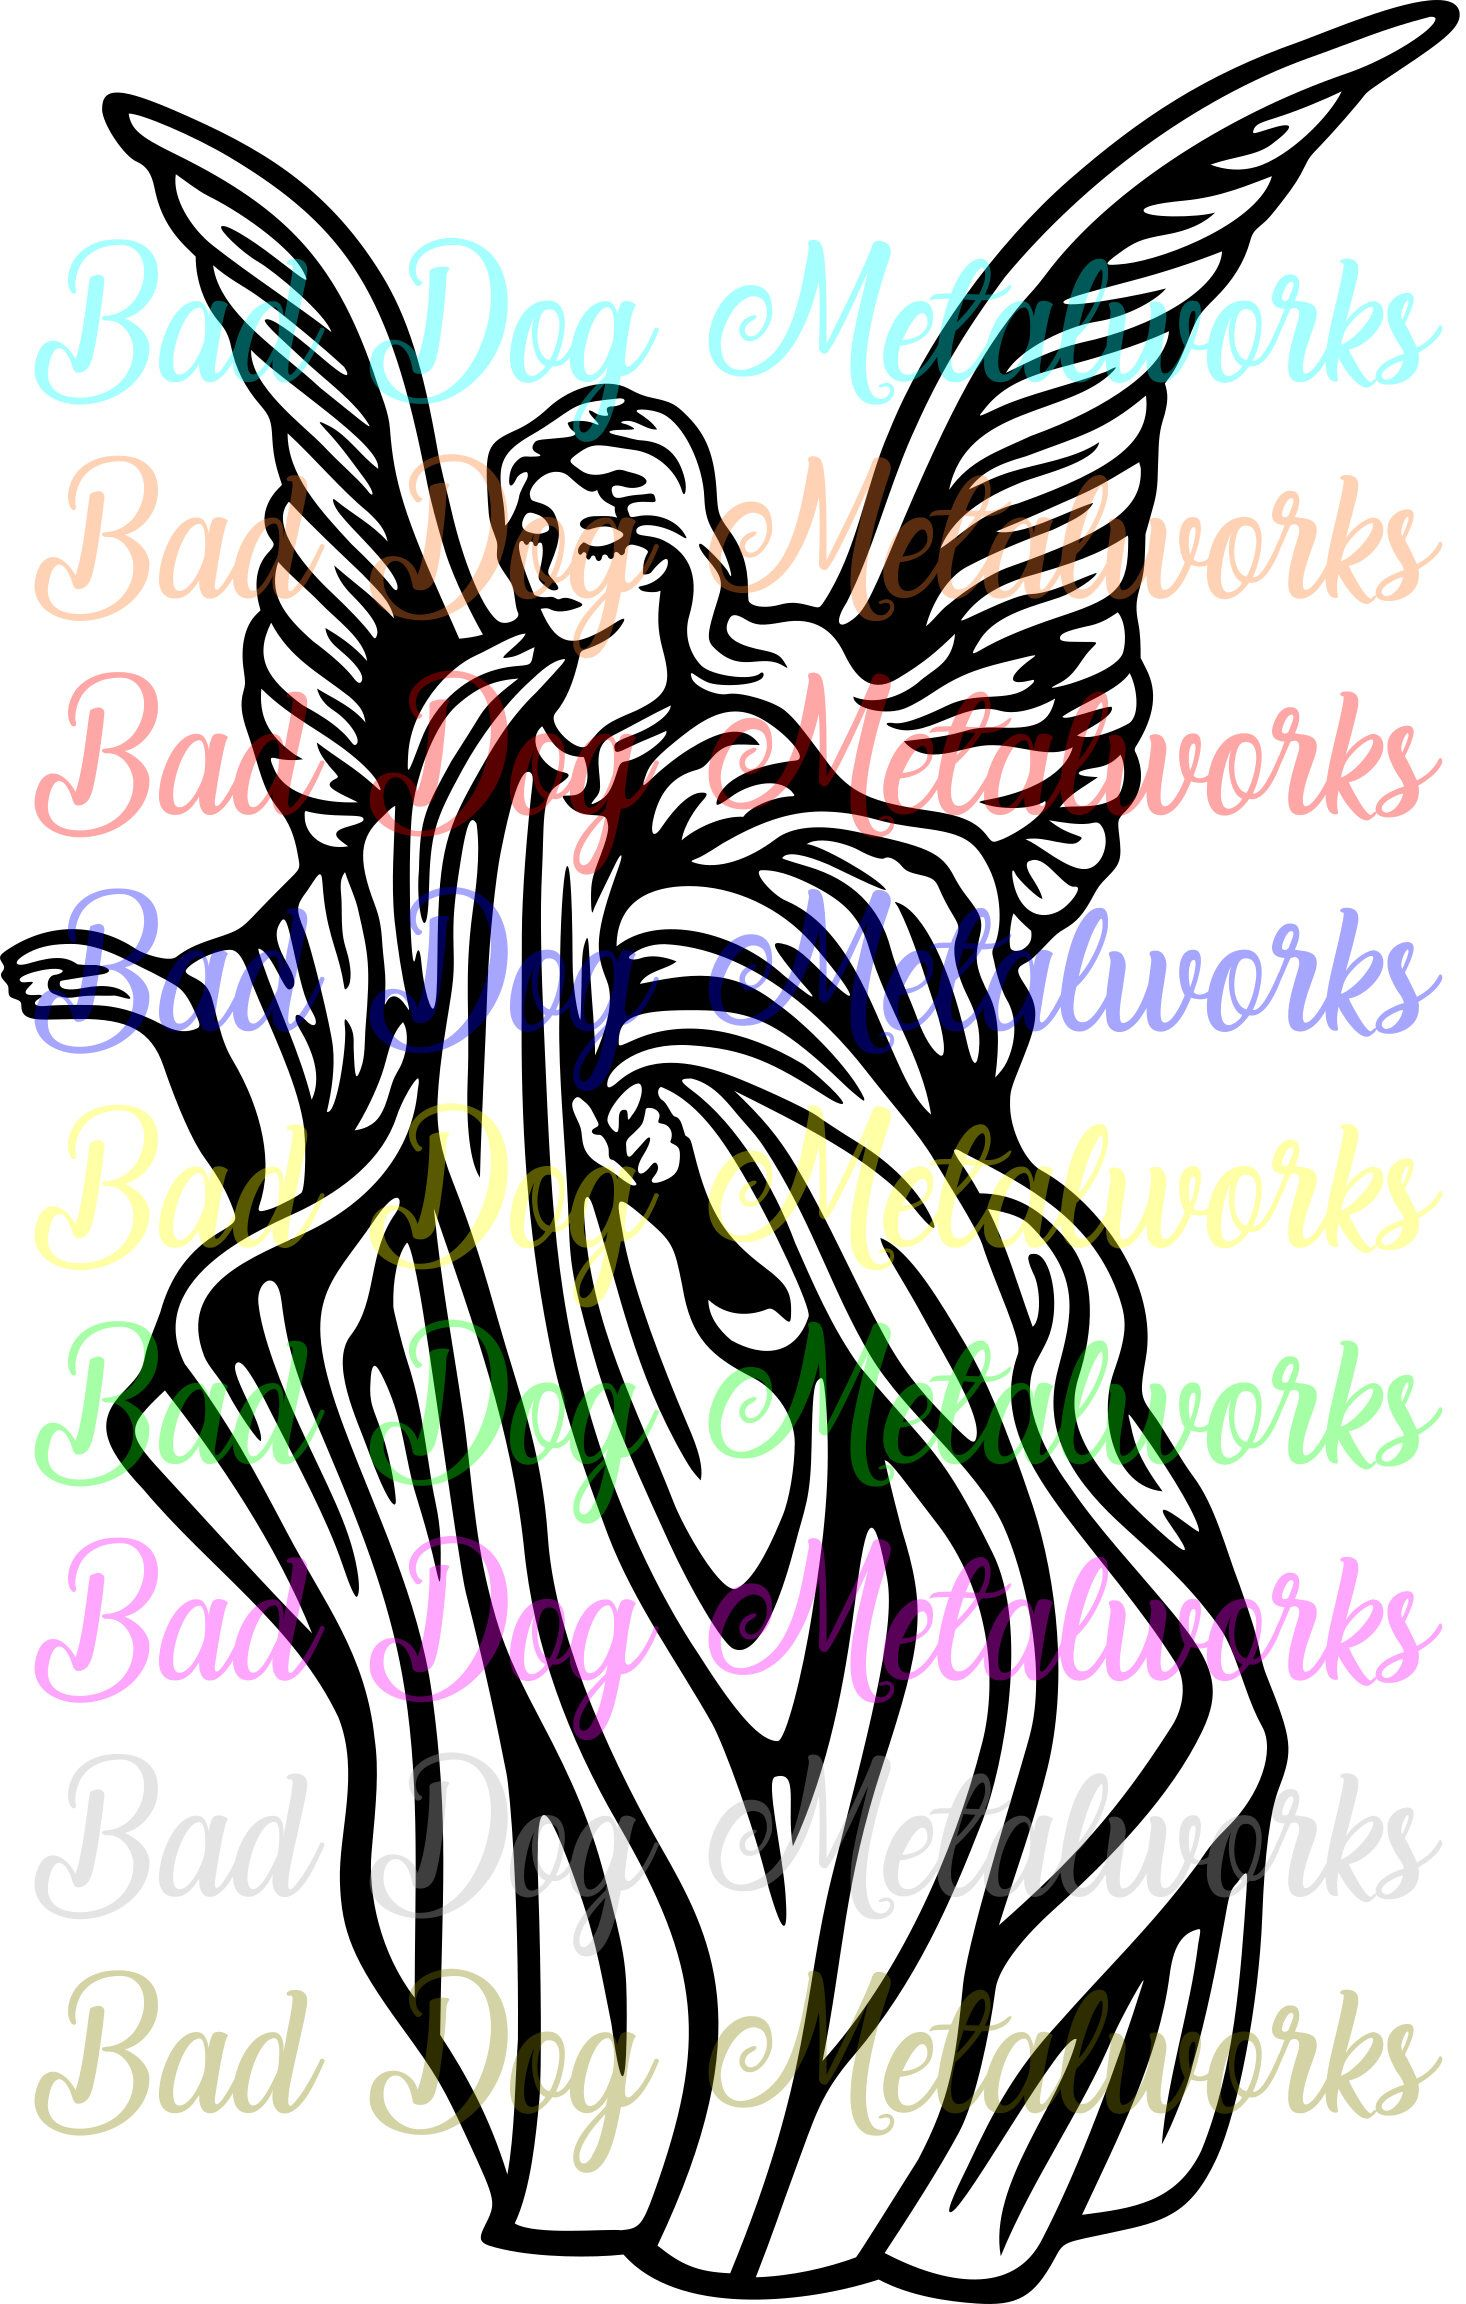 Angels clipart guardian angel. Svg dxf vector art